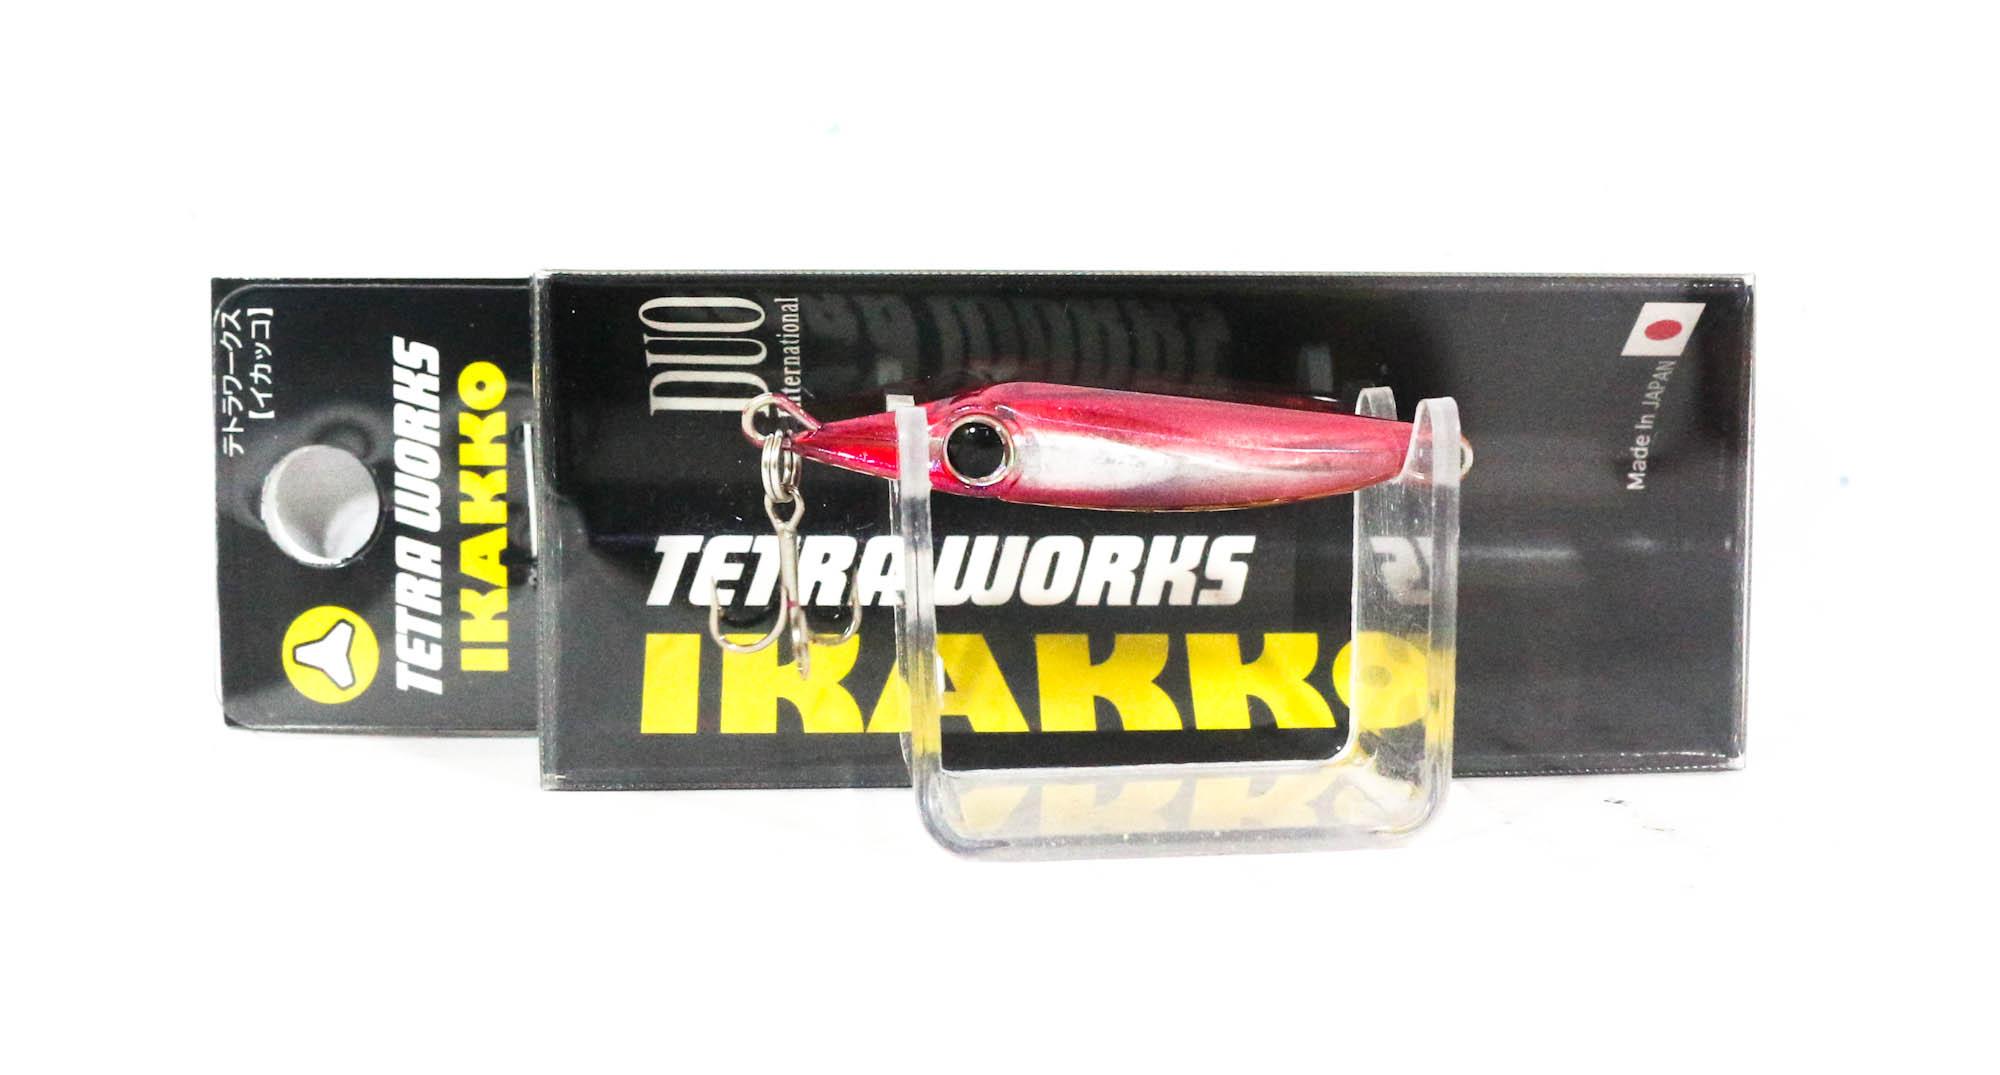 Duo Tetra Works Ikakko 38 mm Sinking Lure CCC0461 (5069)